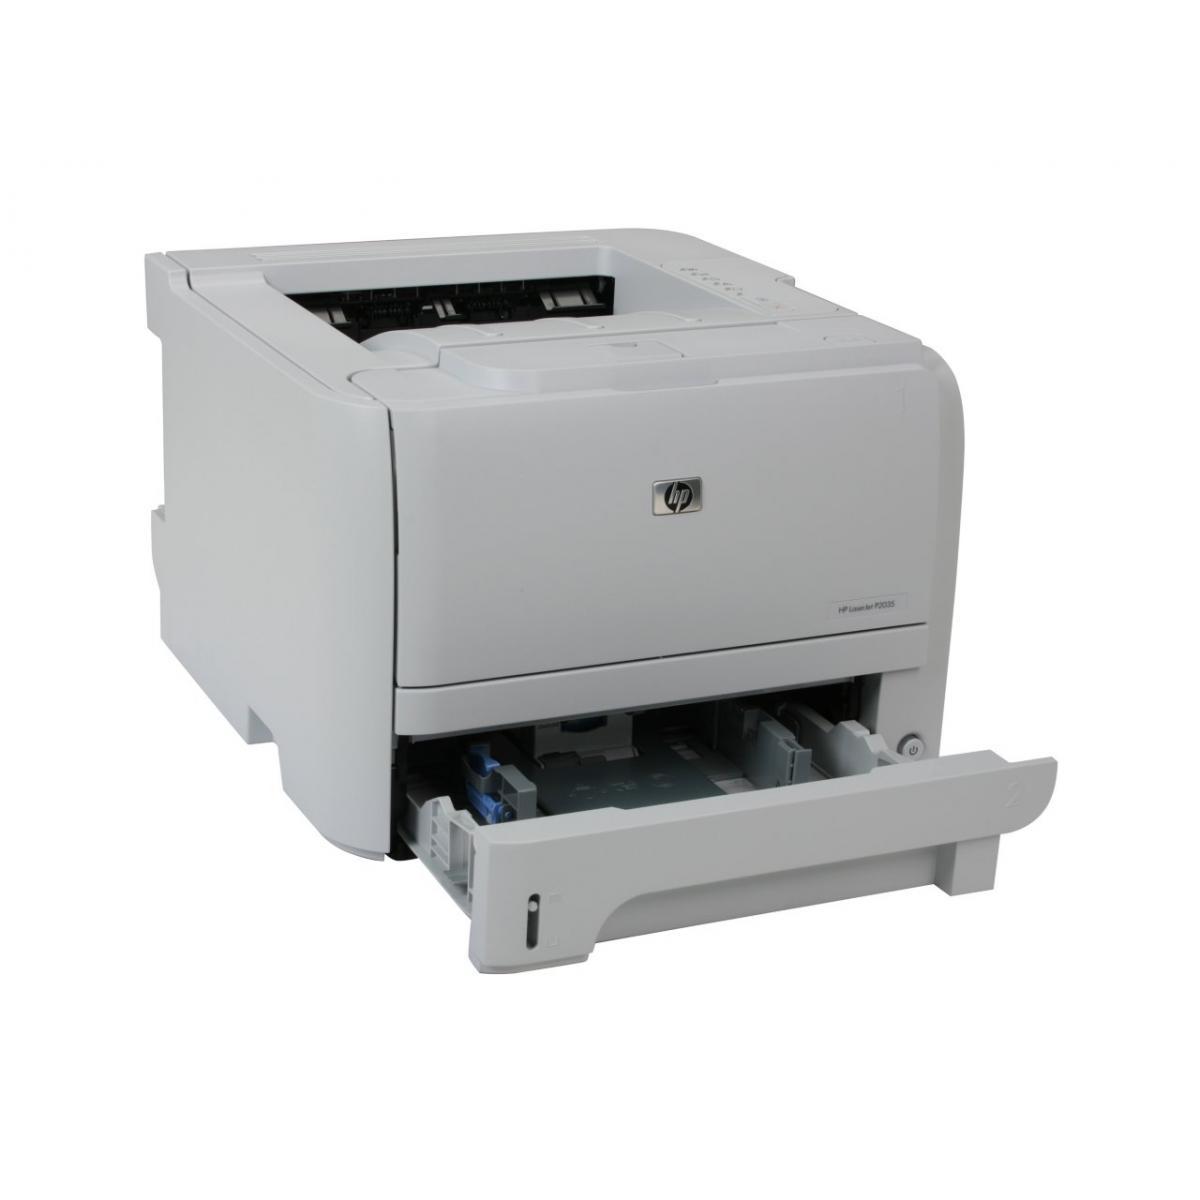 hp laserjet p2035 printer p2035 smart systems amman jordan. Black Bedroom Furniture Sets. Home Design Ideas